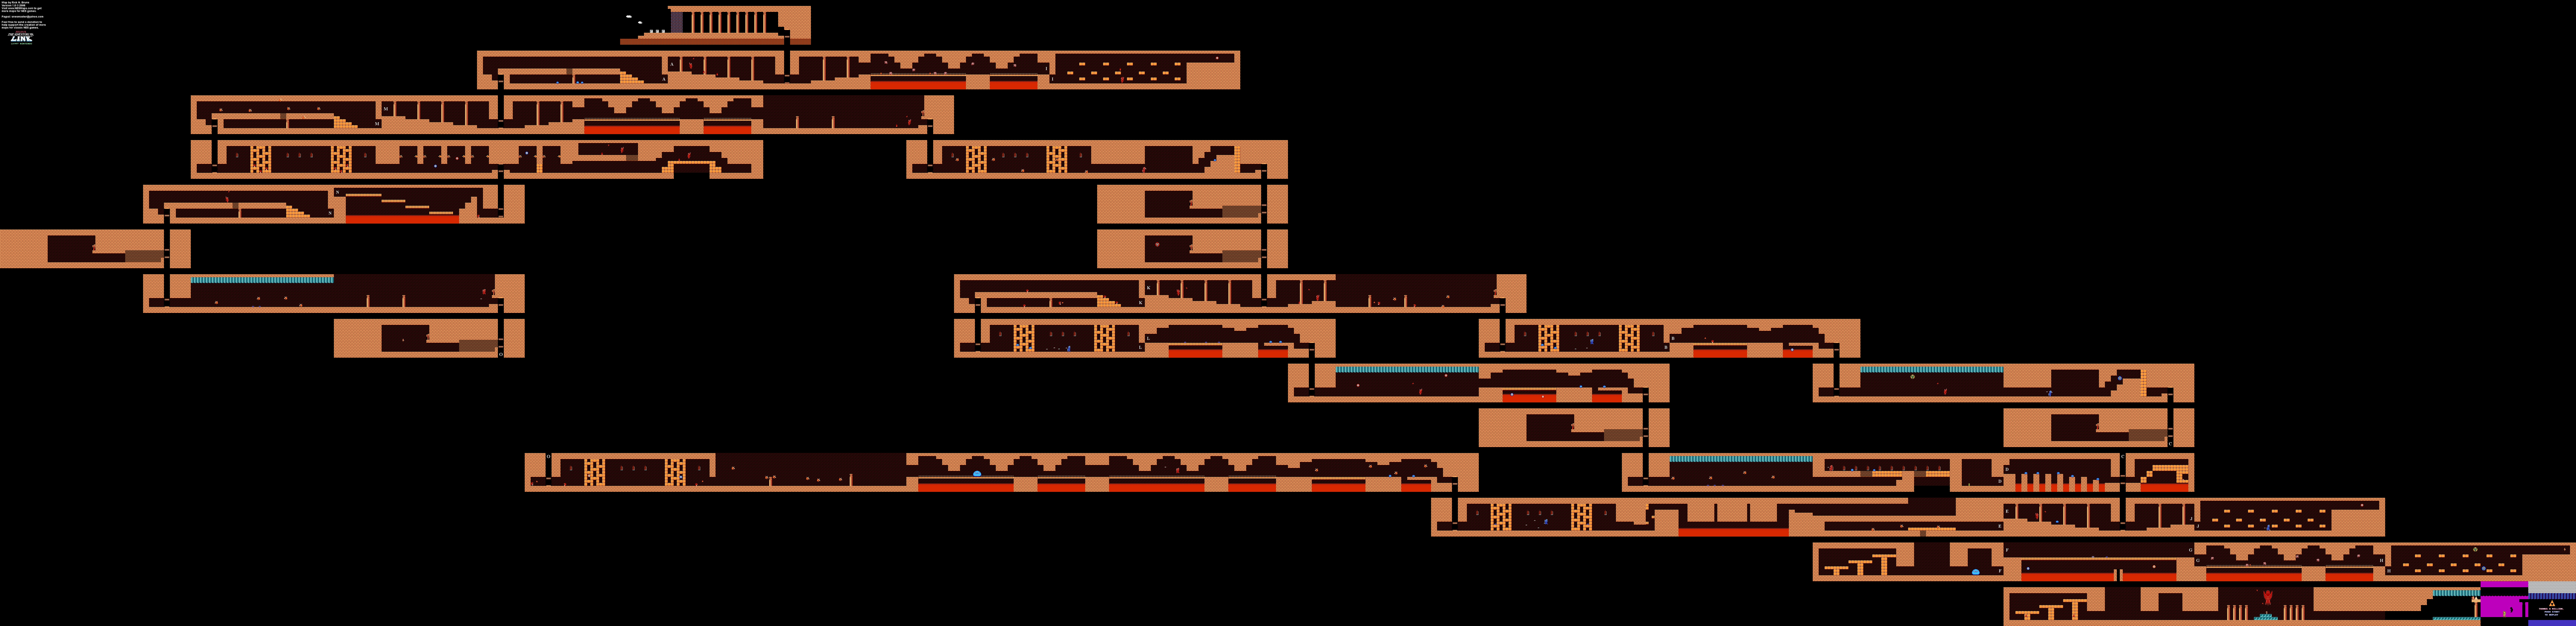 Zelda II - Great Palace (Level 7) Map [39]